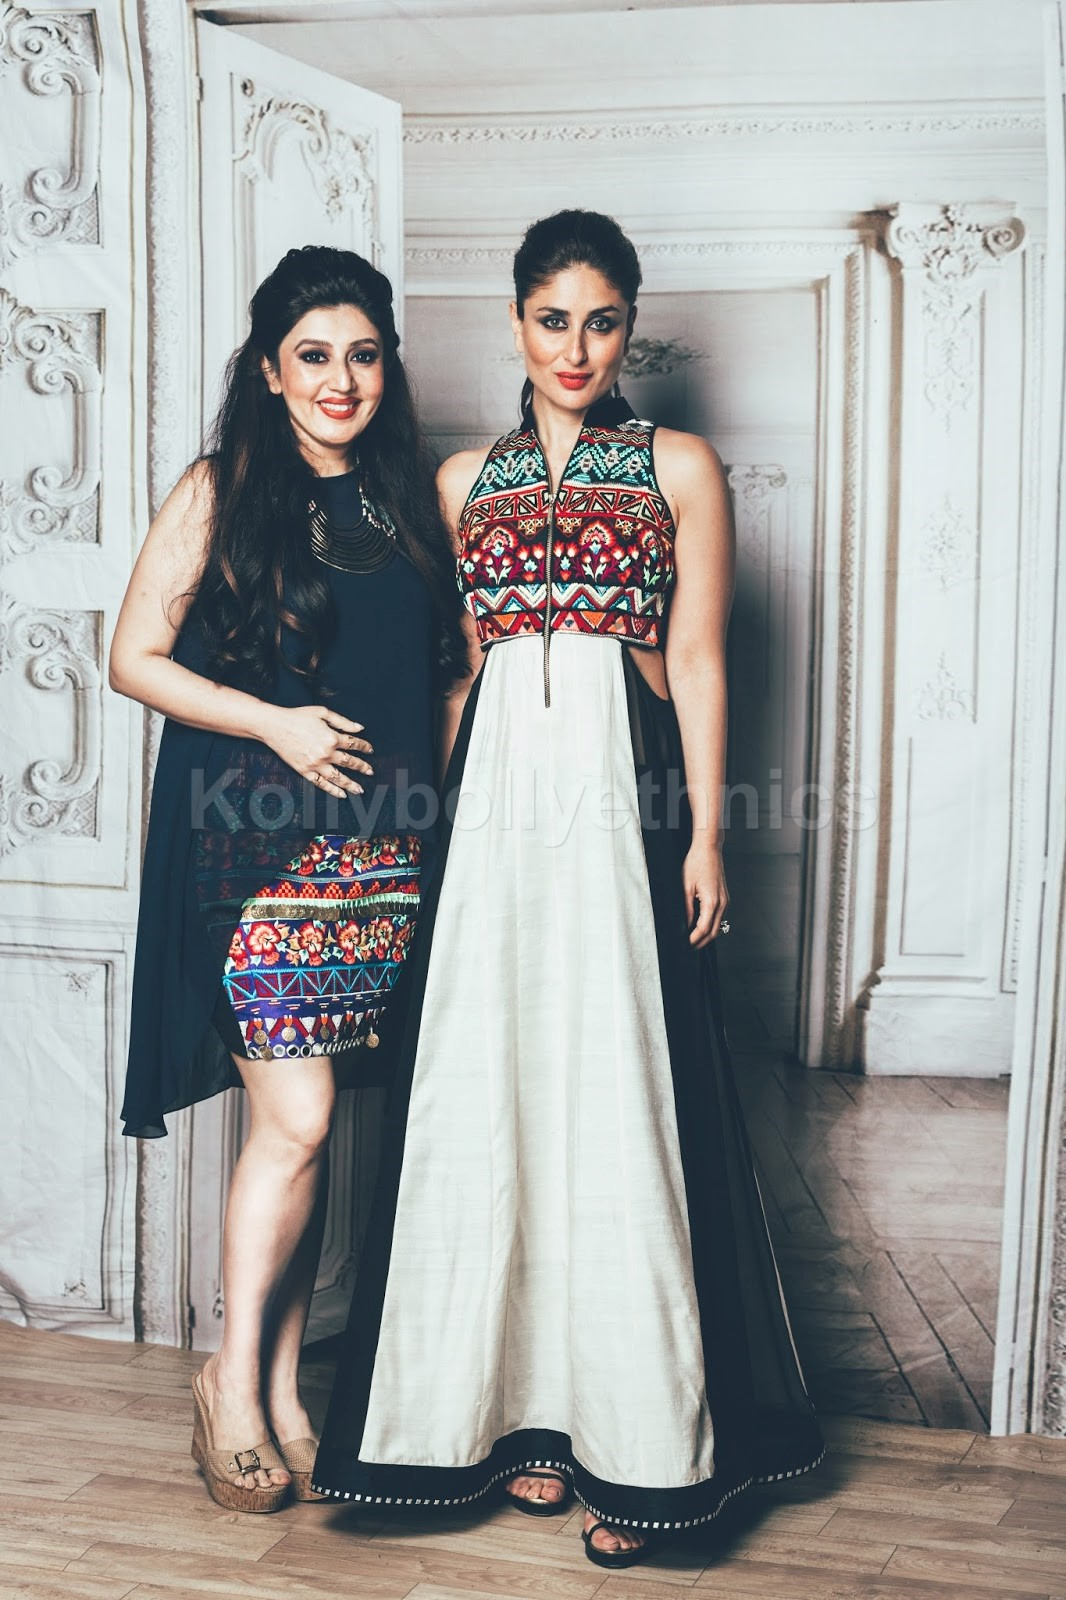 159c71c4908c3 Buy Bollywood Style Kareena kapoor white and black raw silk kurti ...